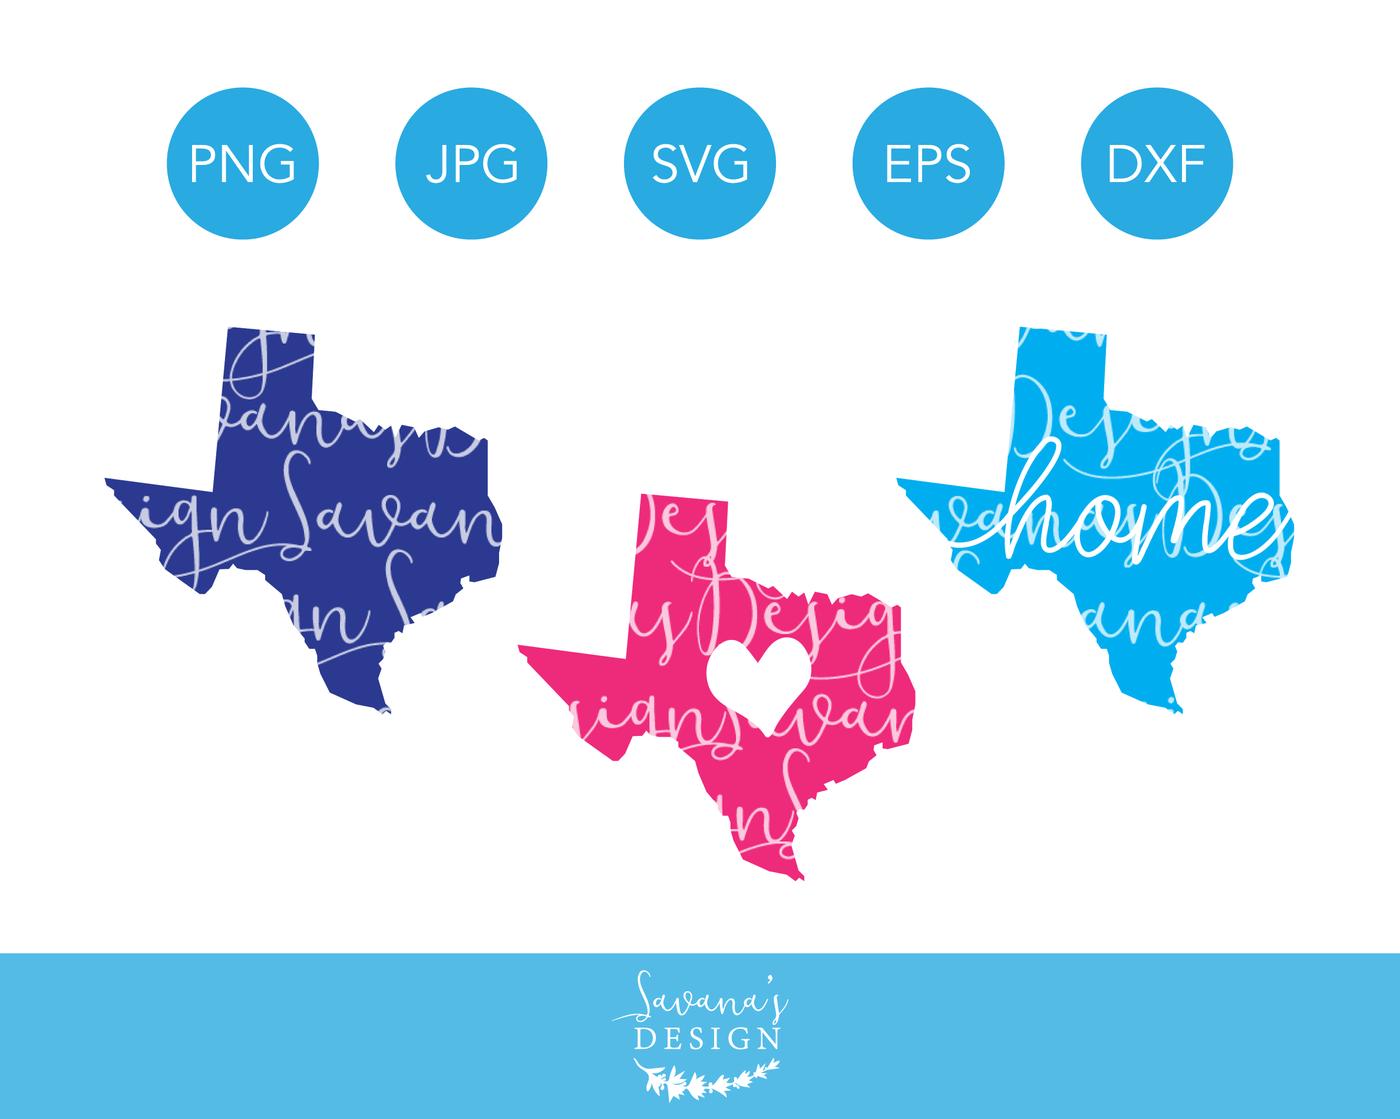 Texas Svg Texas Home Svg Texas Dxf Texas Cut File Texas Svg